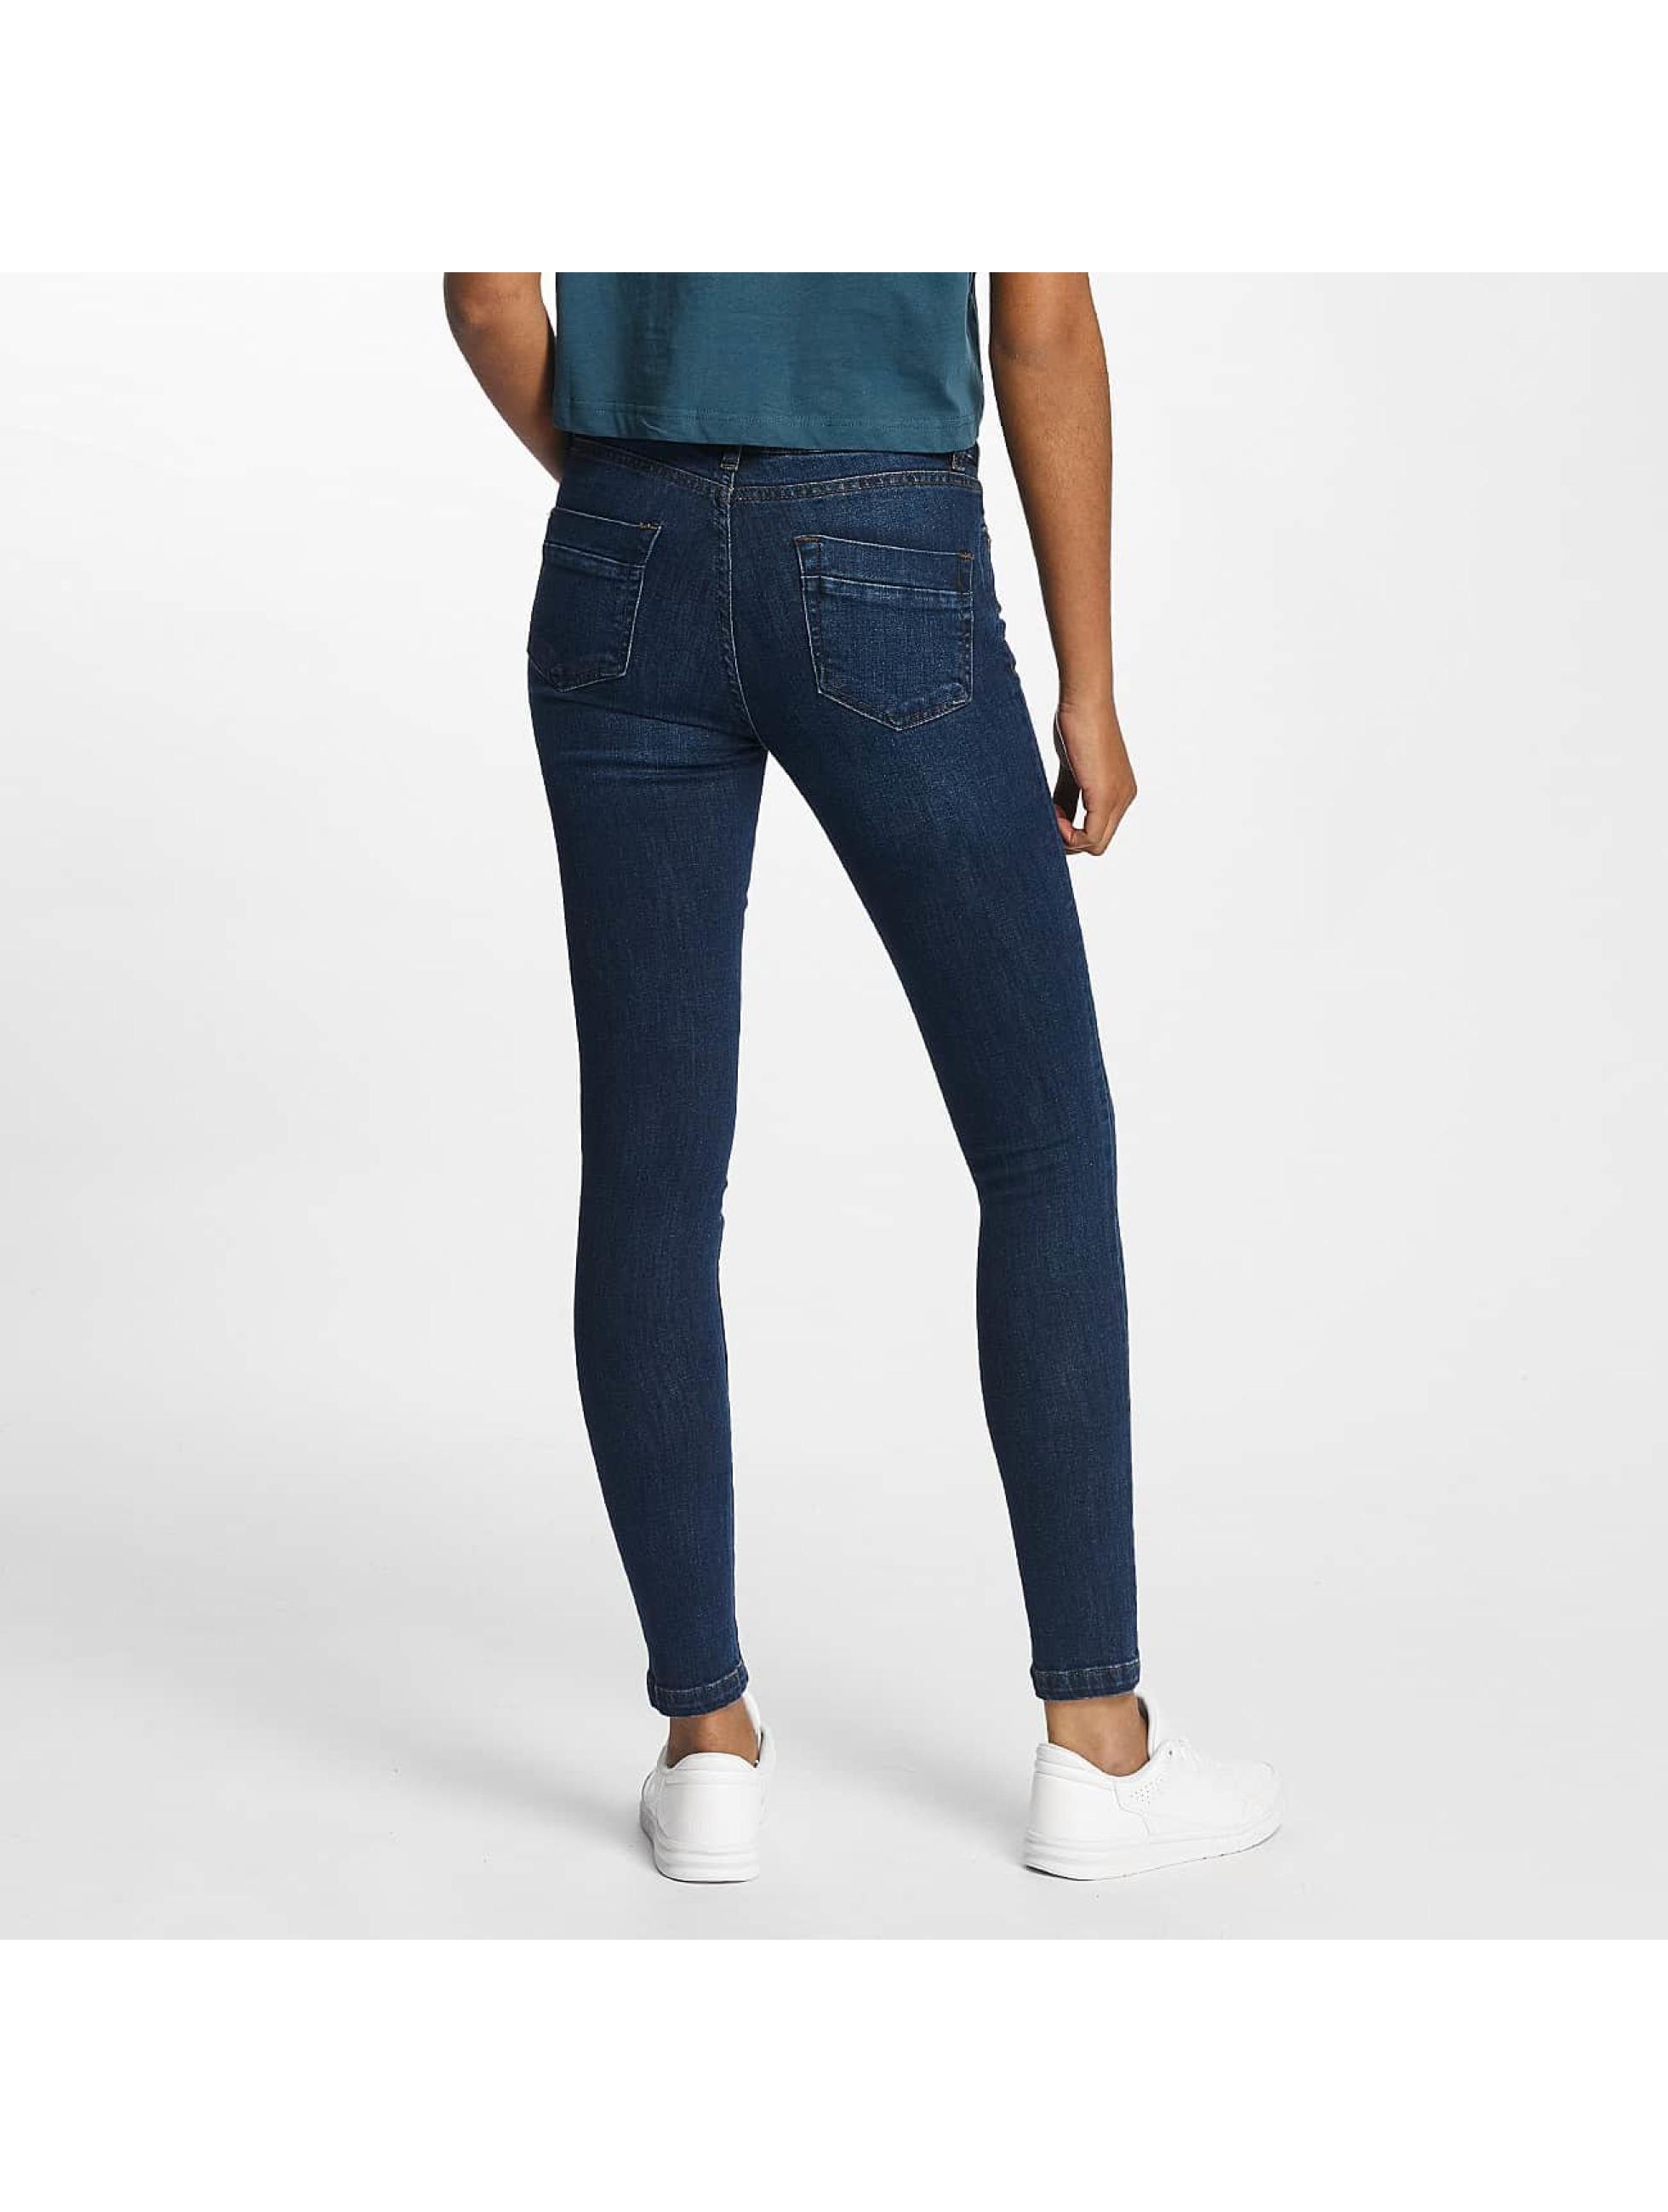 Urban Classics Skinny Jeans Skinny Denim blau